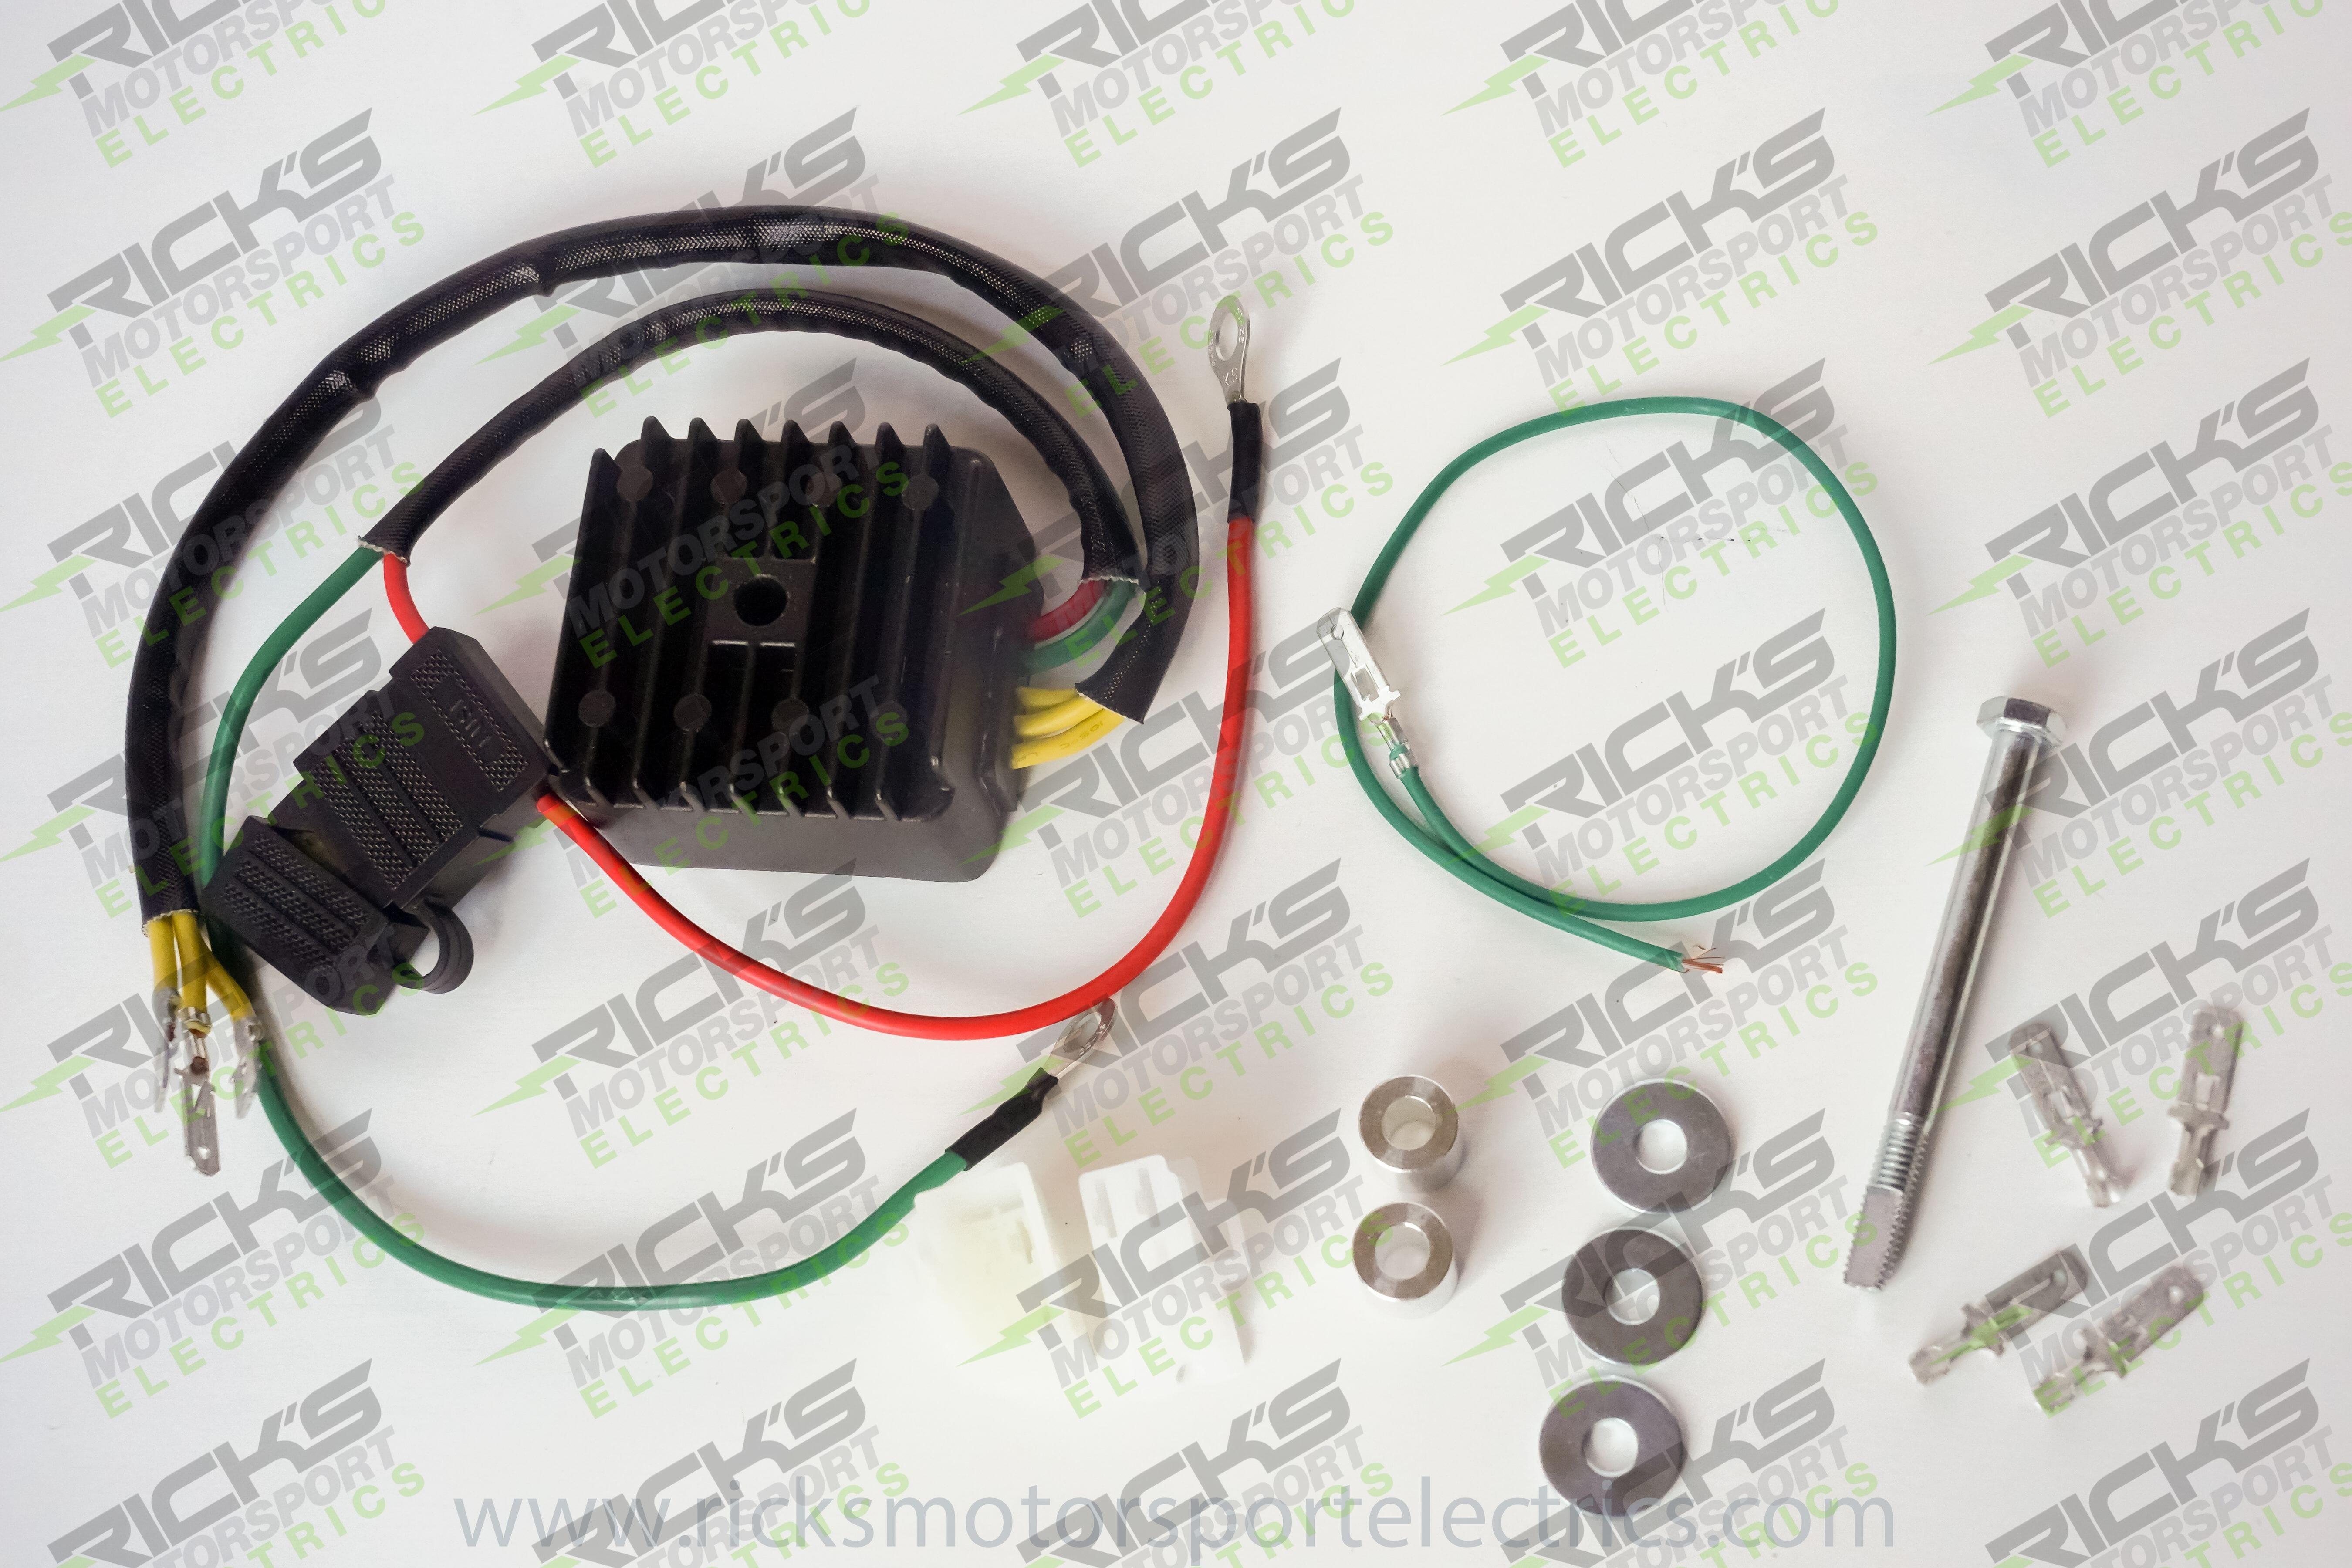 Hot Shot Series Rectifier Regulator Lithium Compatible 14_164H #2